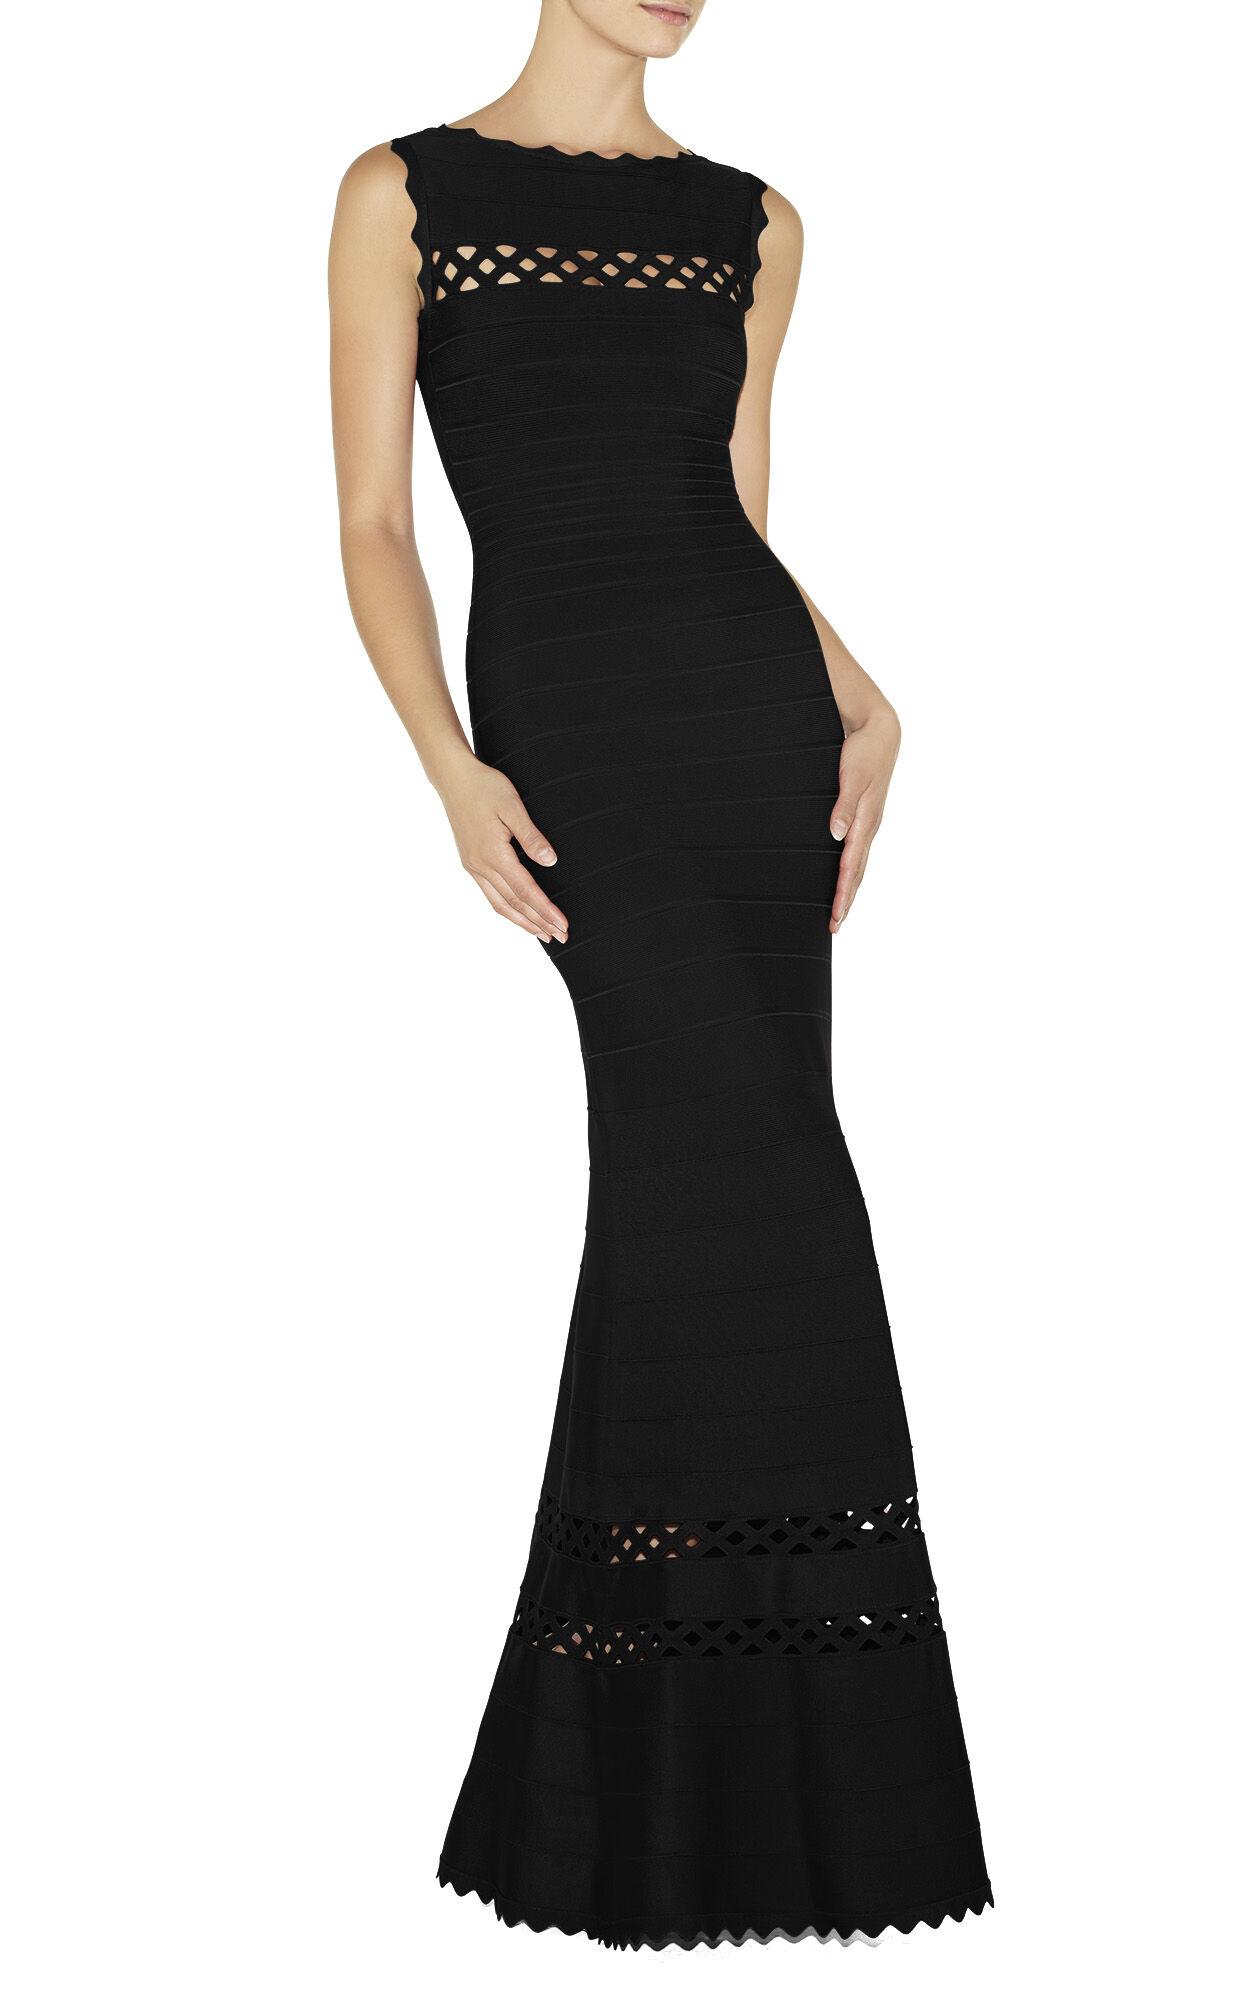 Nathalie Bandage Gown